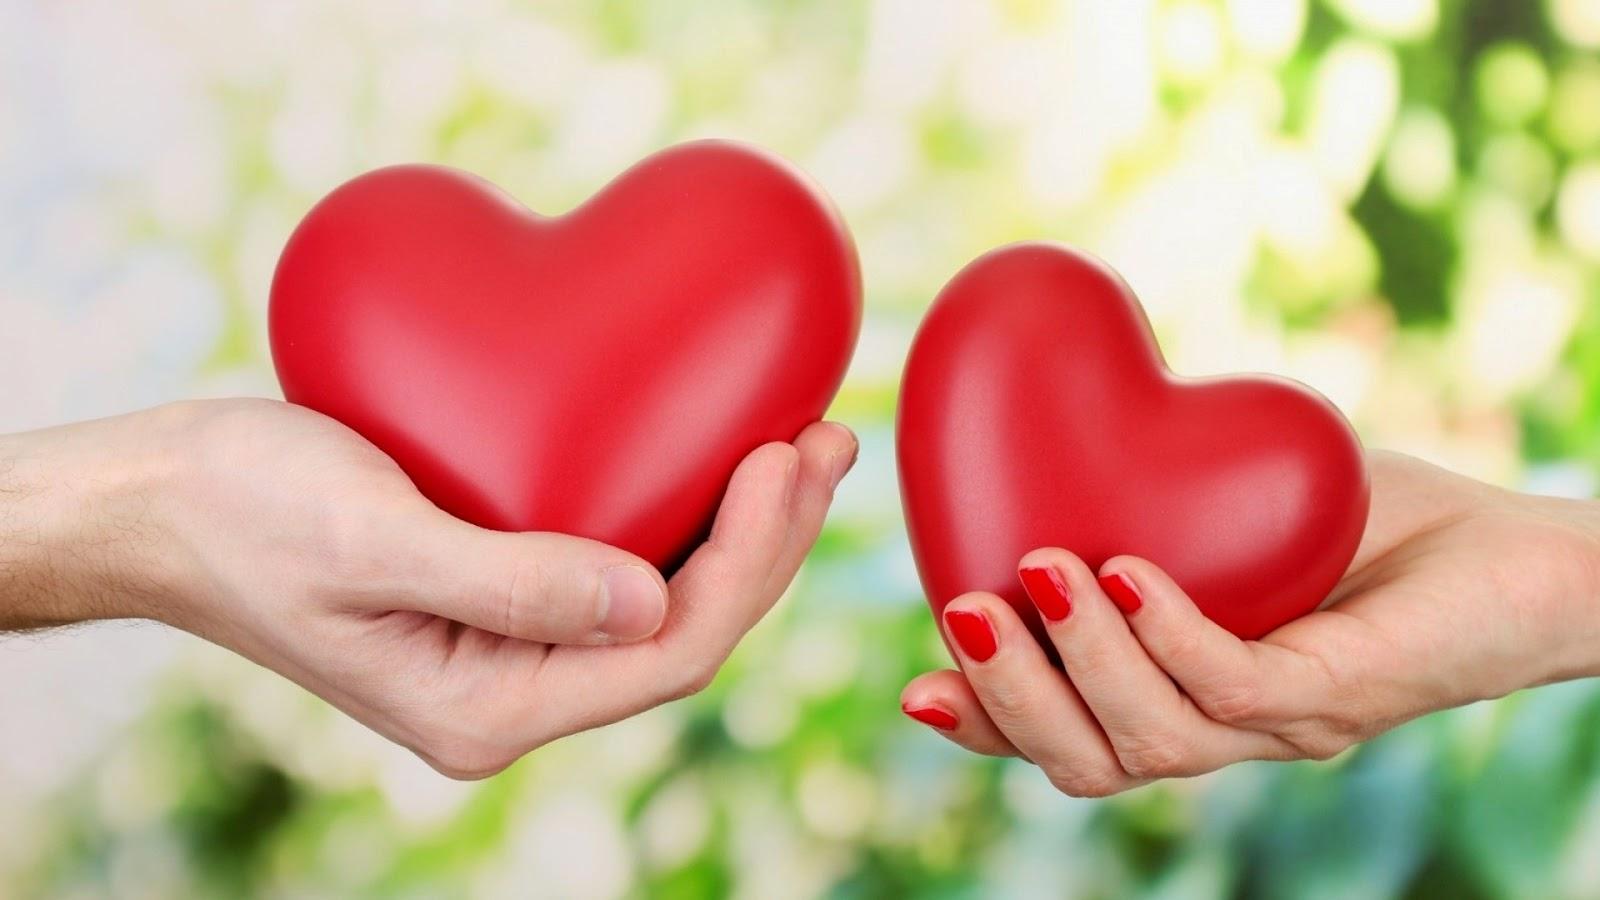 free download wallpaper of love heart